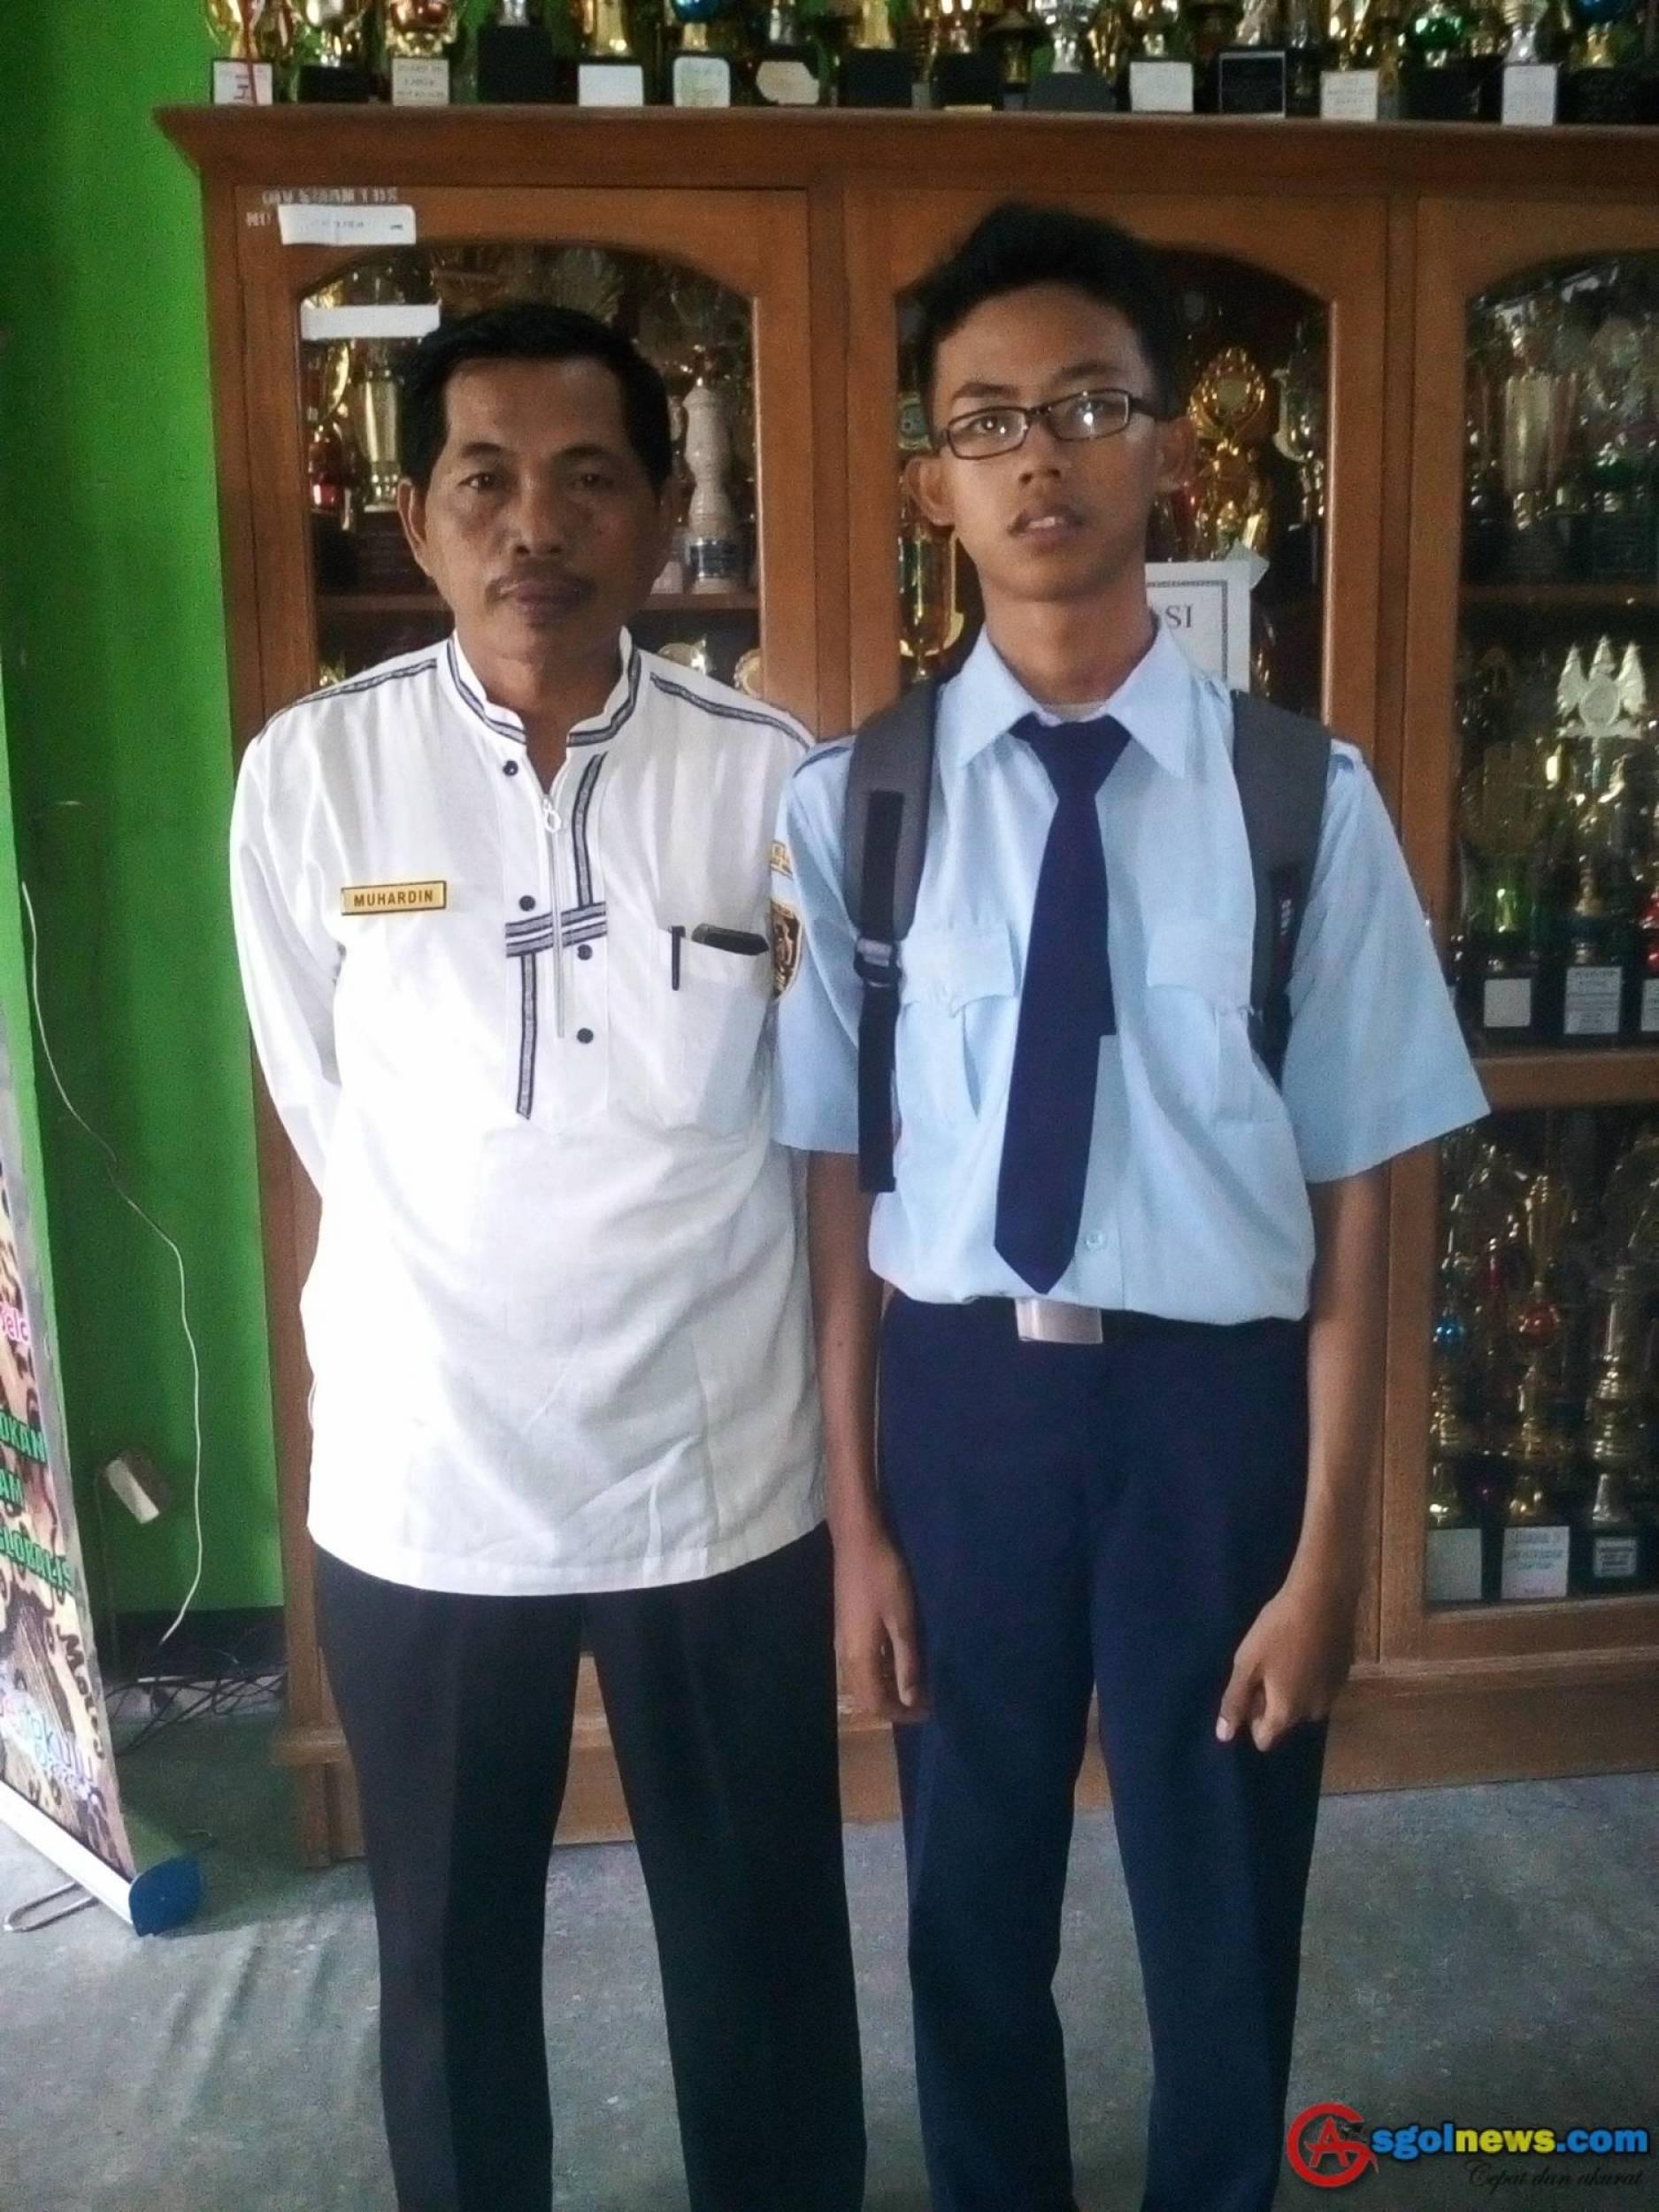 Siswa SMA Negeri 1 Bengkulu Selatan Wakili Bengkulu Di LSN Tingkat Nasional